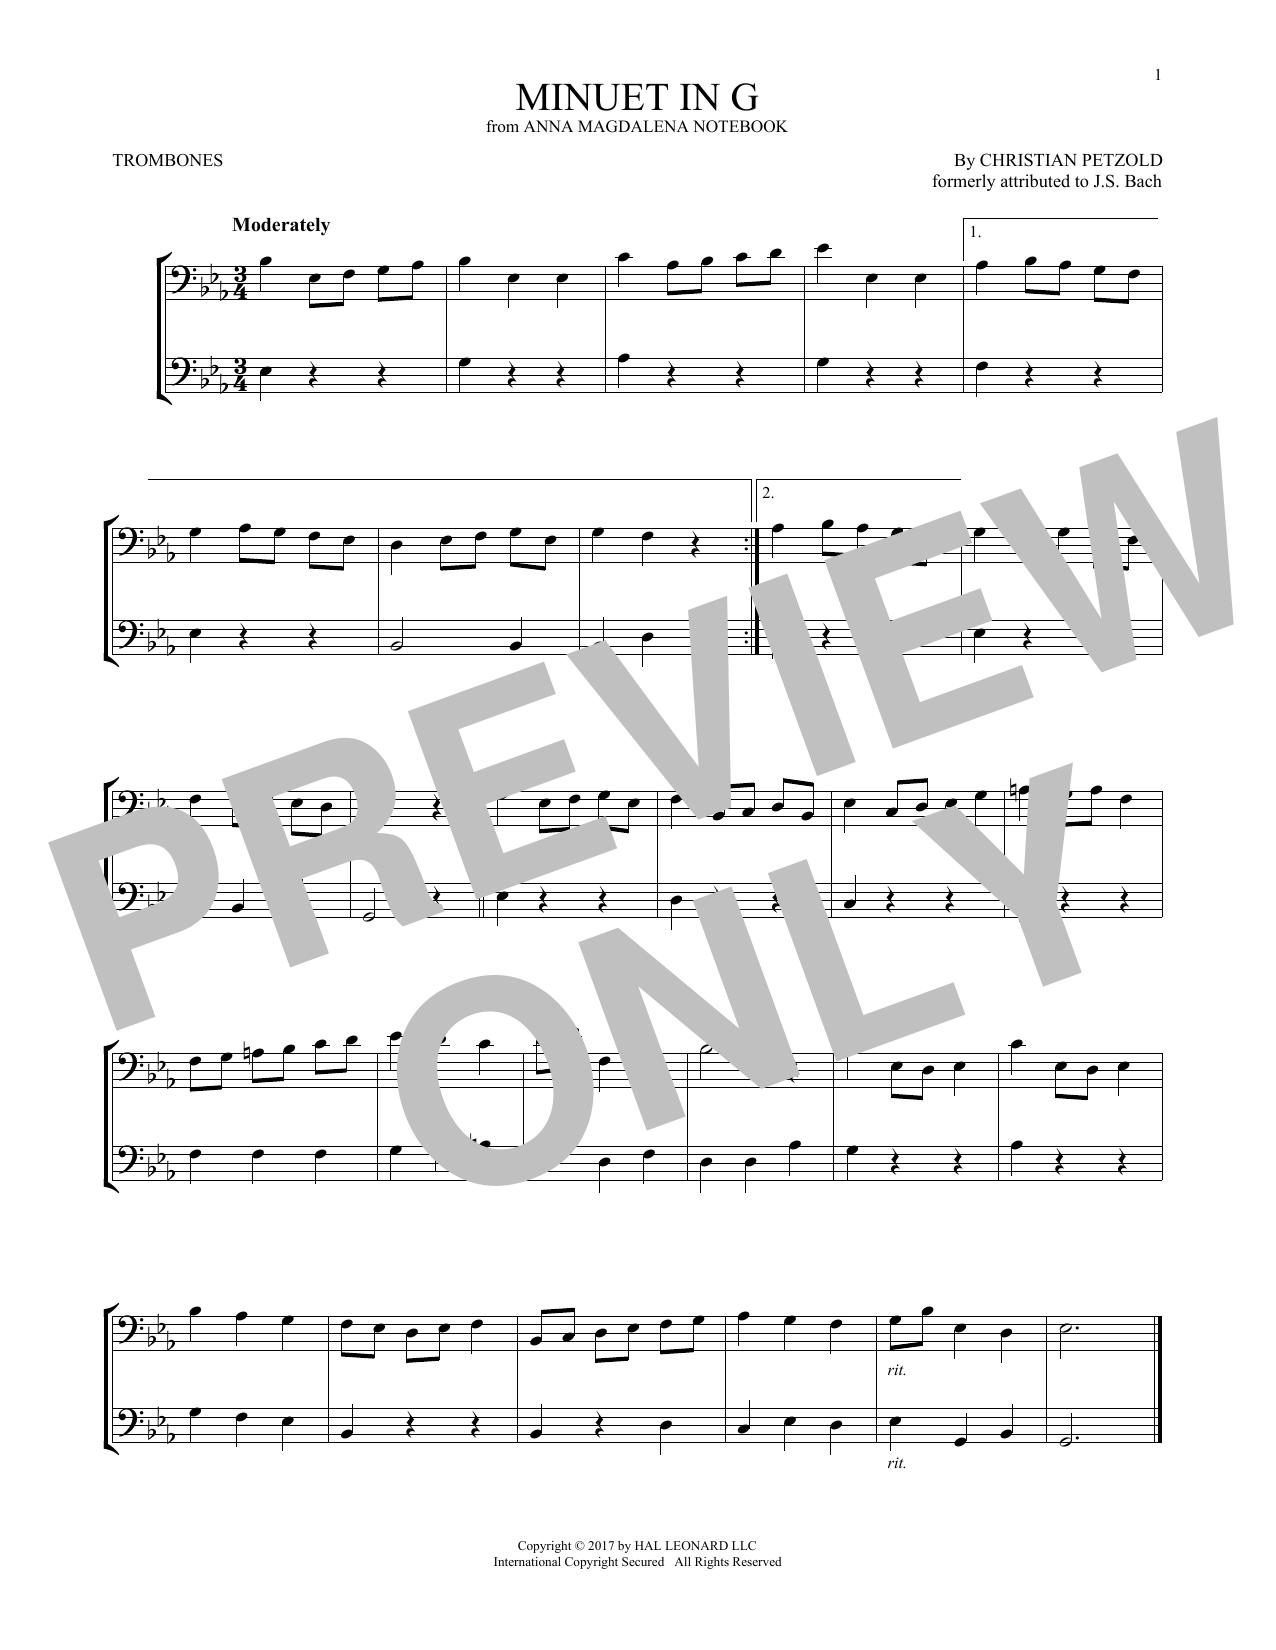 Minuet In G Major, BWV Anh. 114 (Trombone Duet)